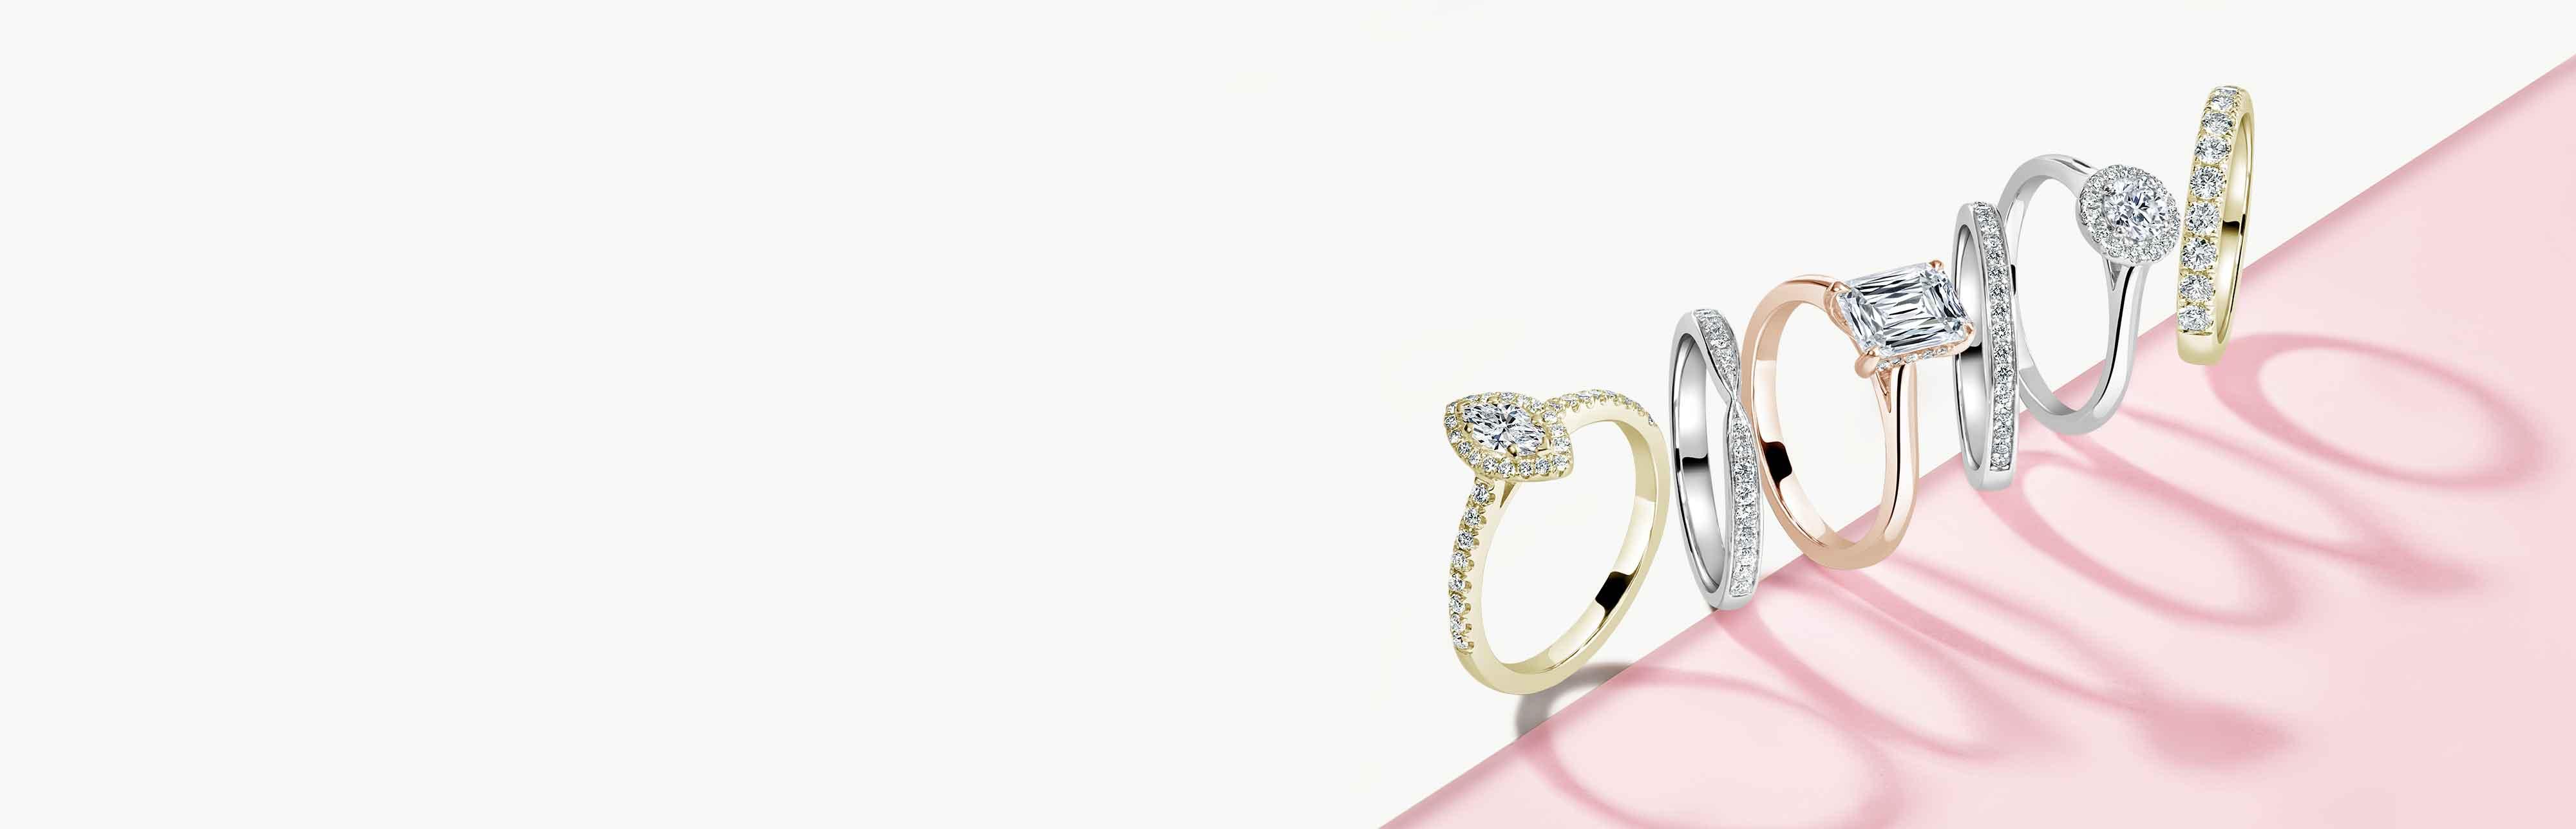 Platinum Halo Engagement Rings - Steven Stone